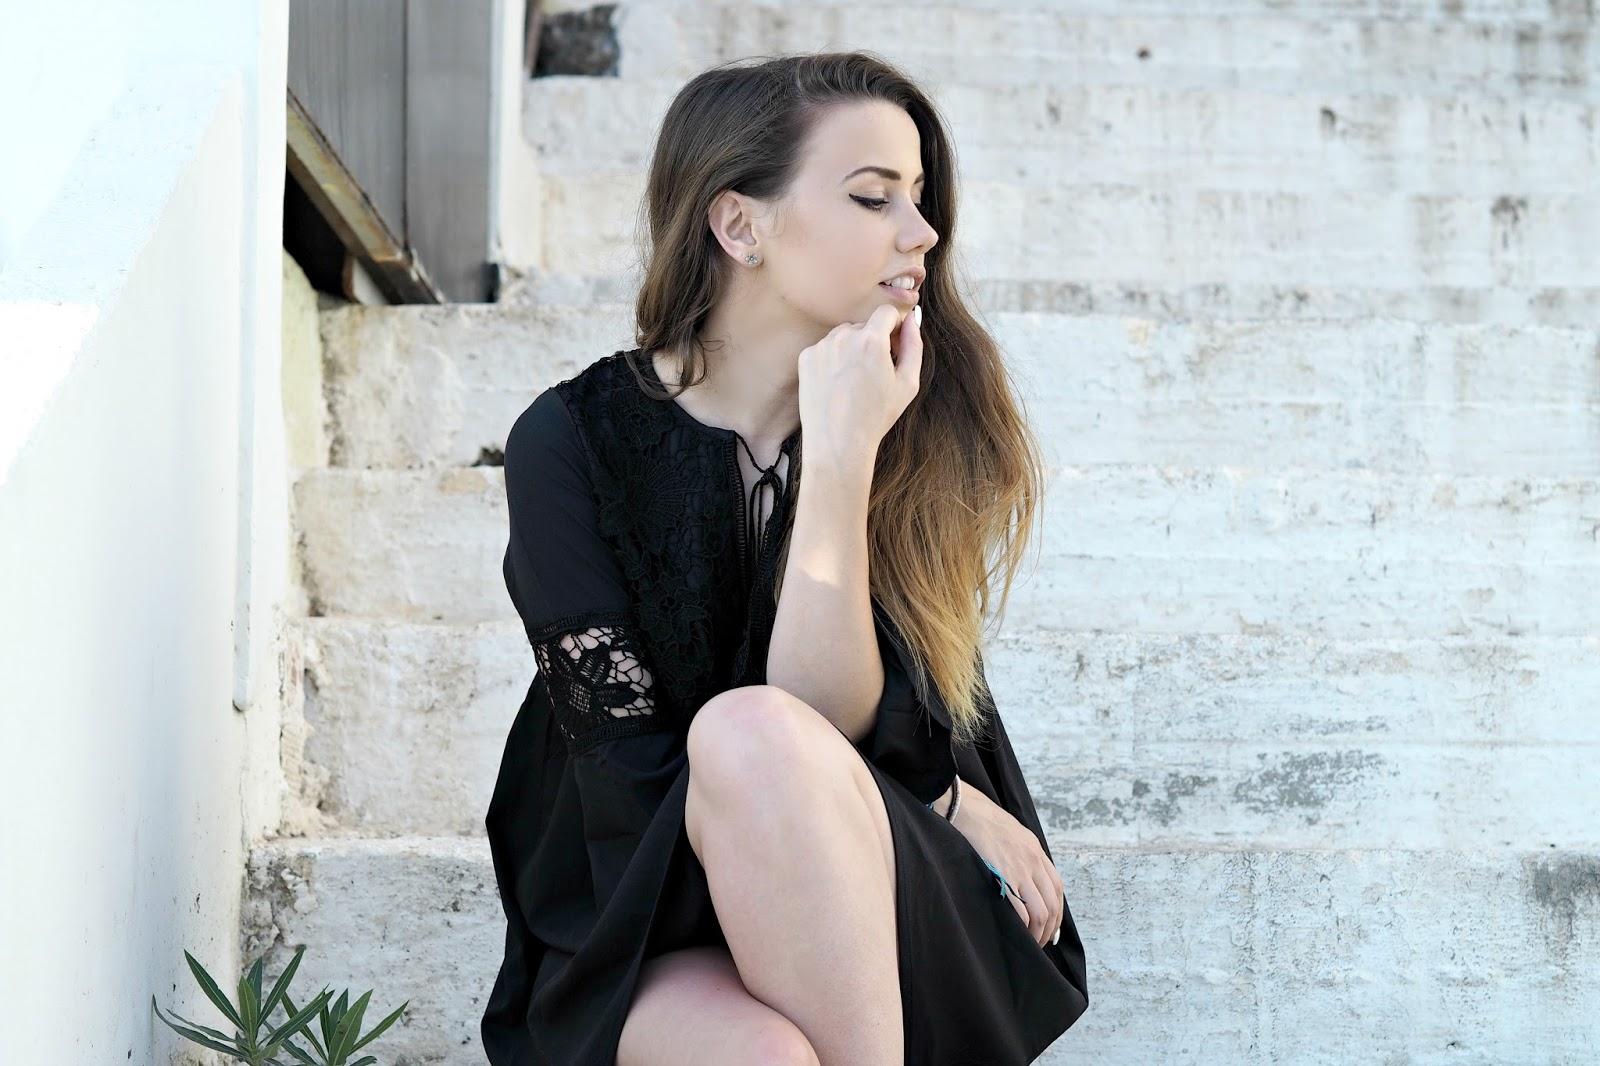 ermioni greece, summer fashion